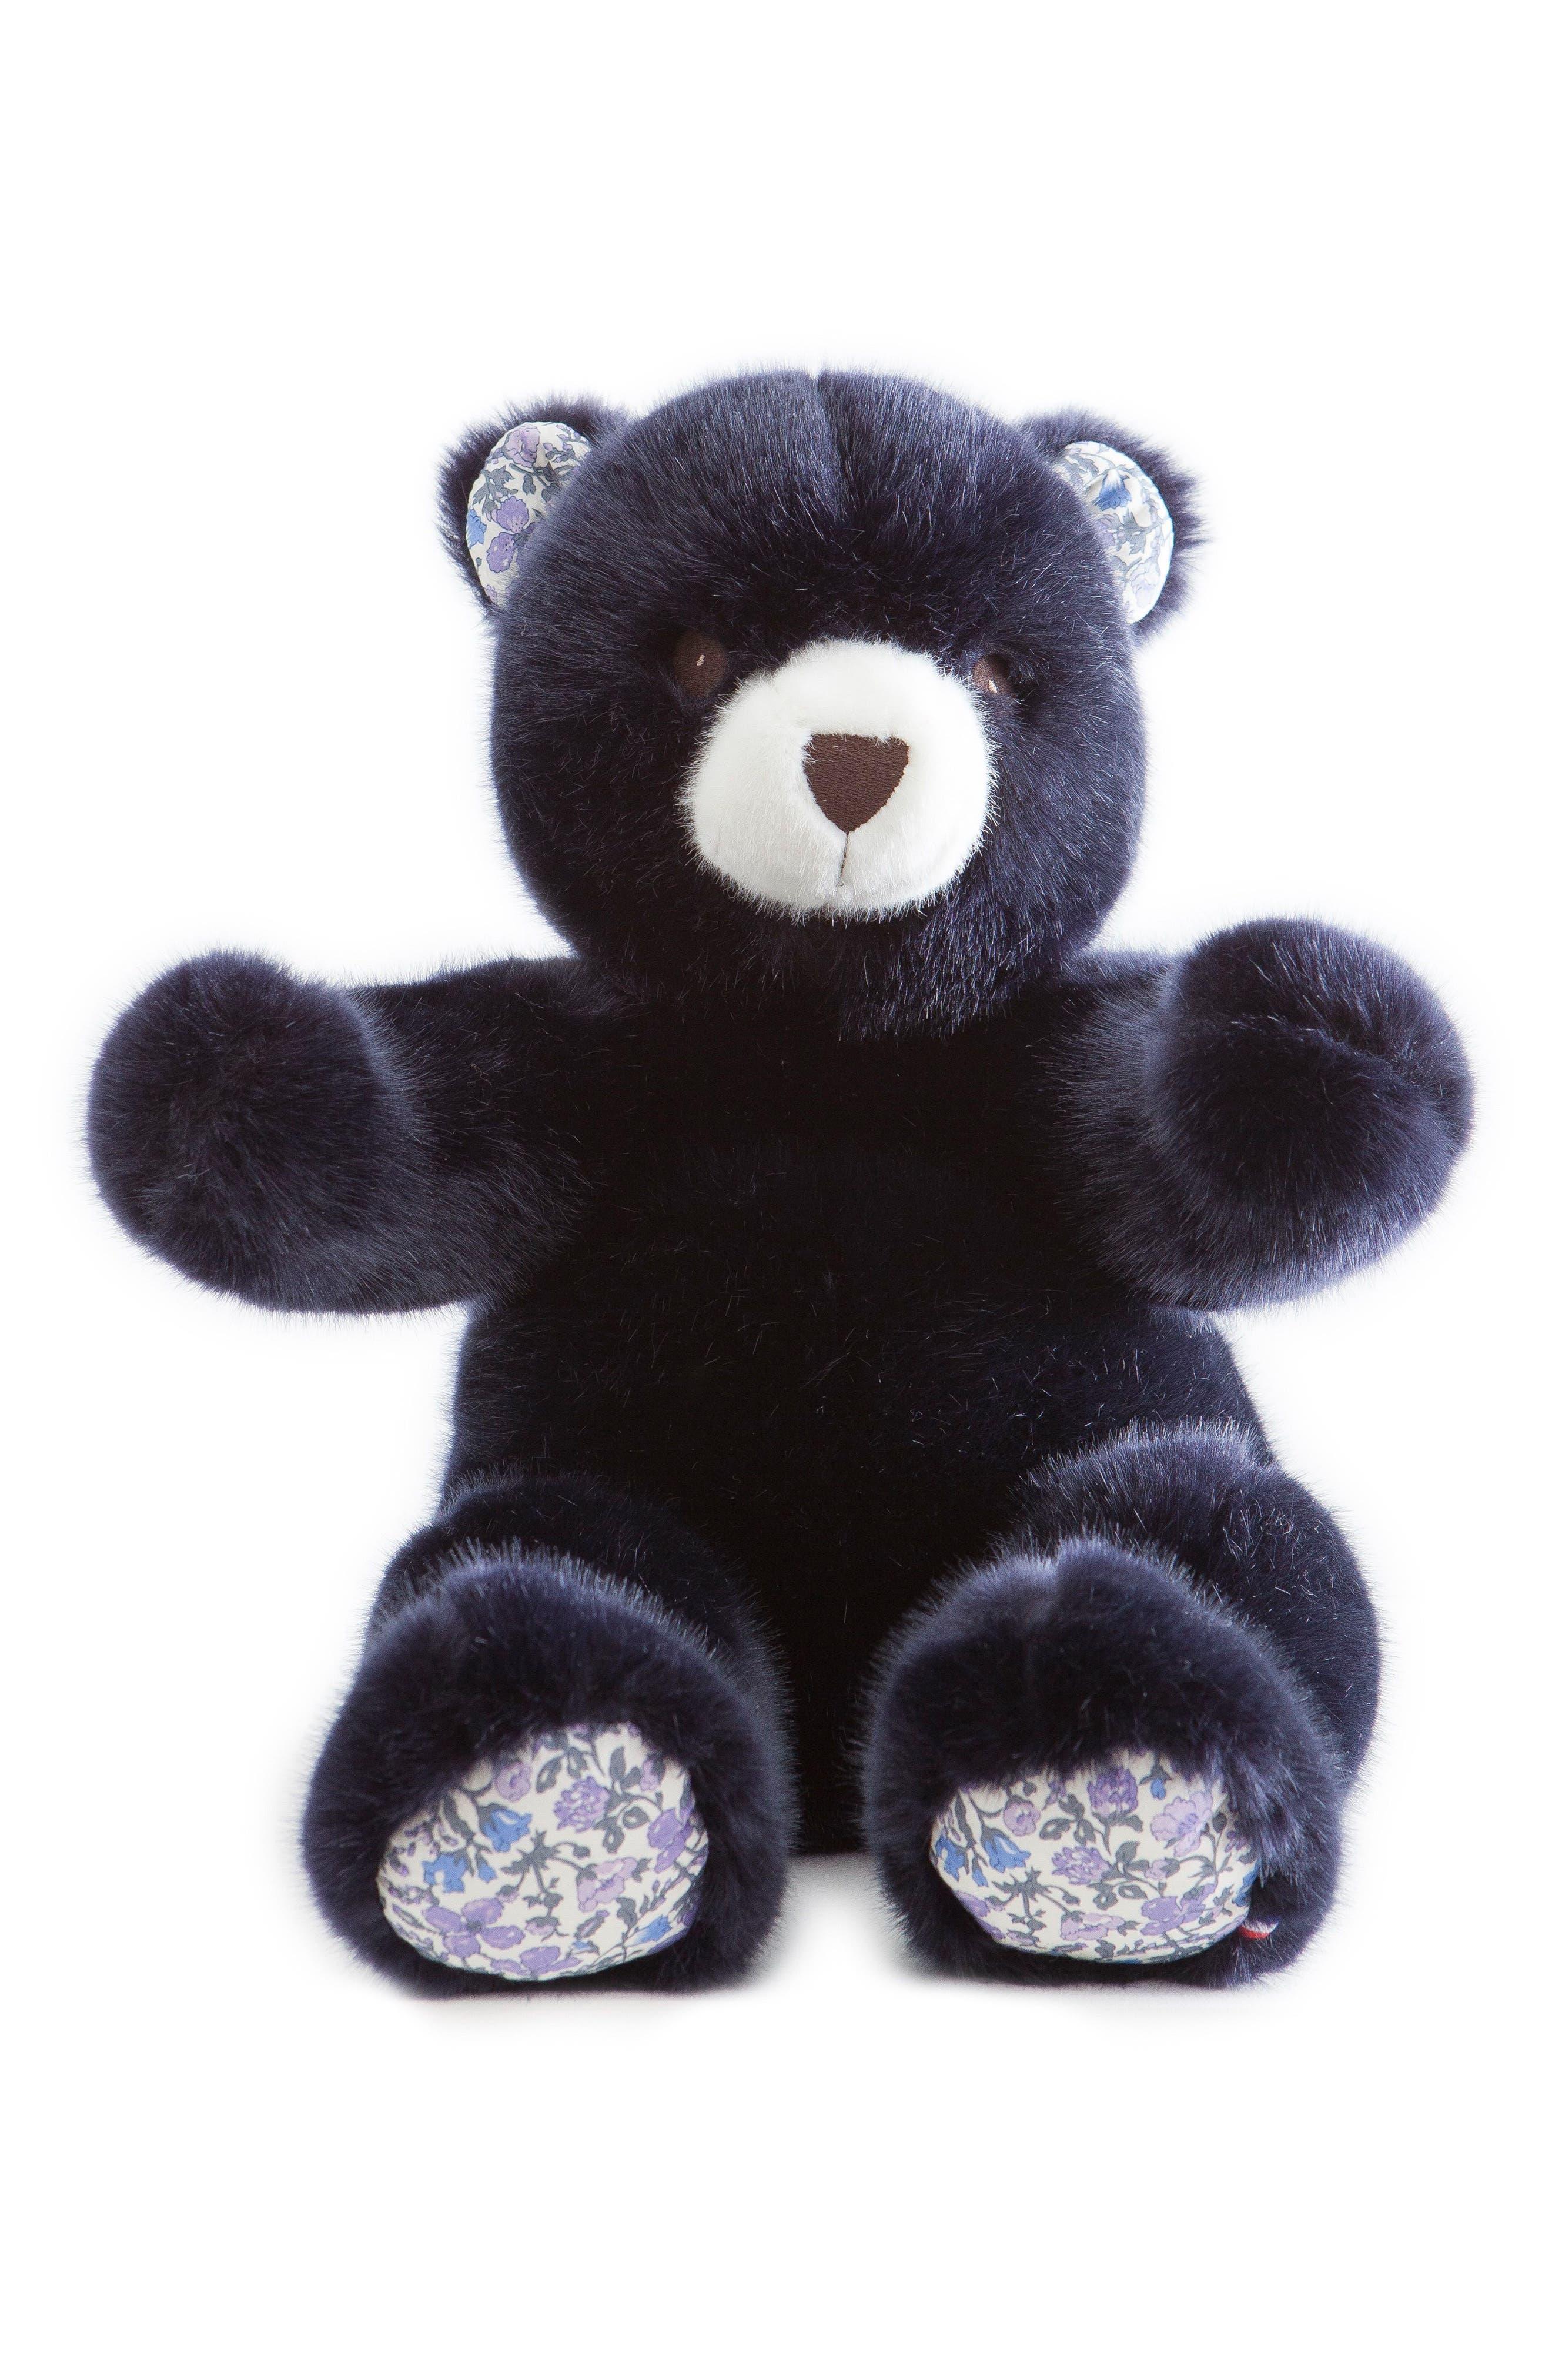 Pamplemousse Peluches x Liberty of London Robert the Bear Stuffed Animal